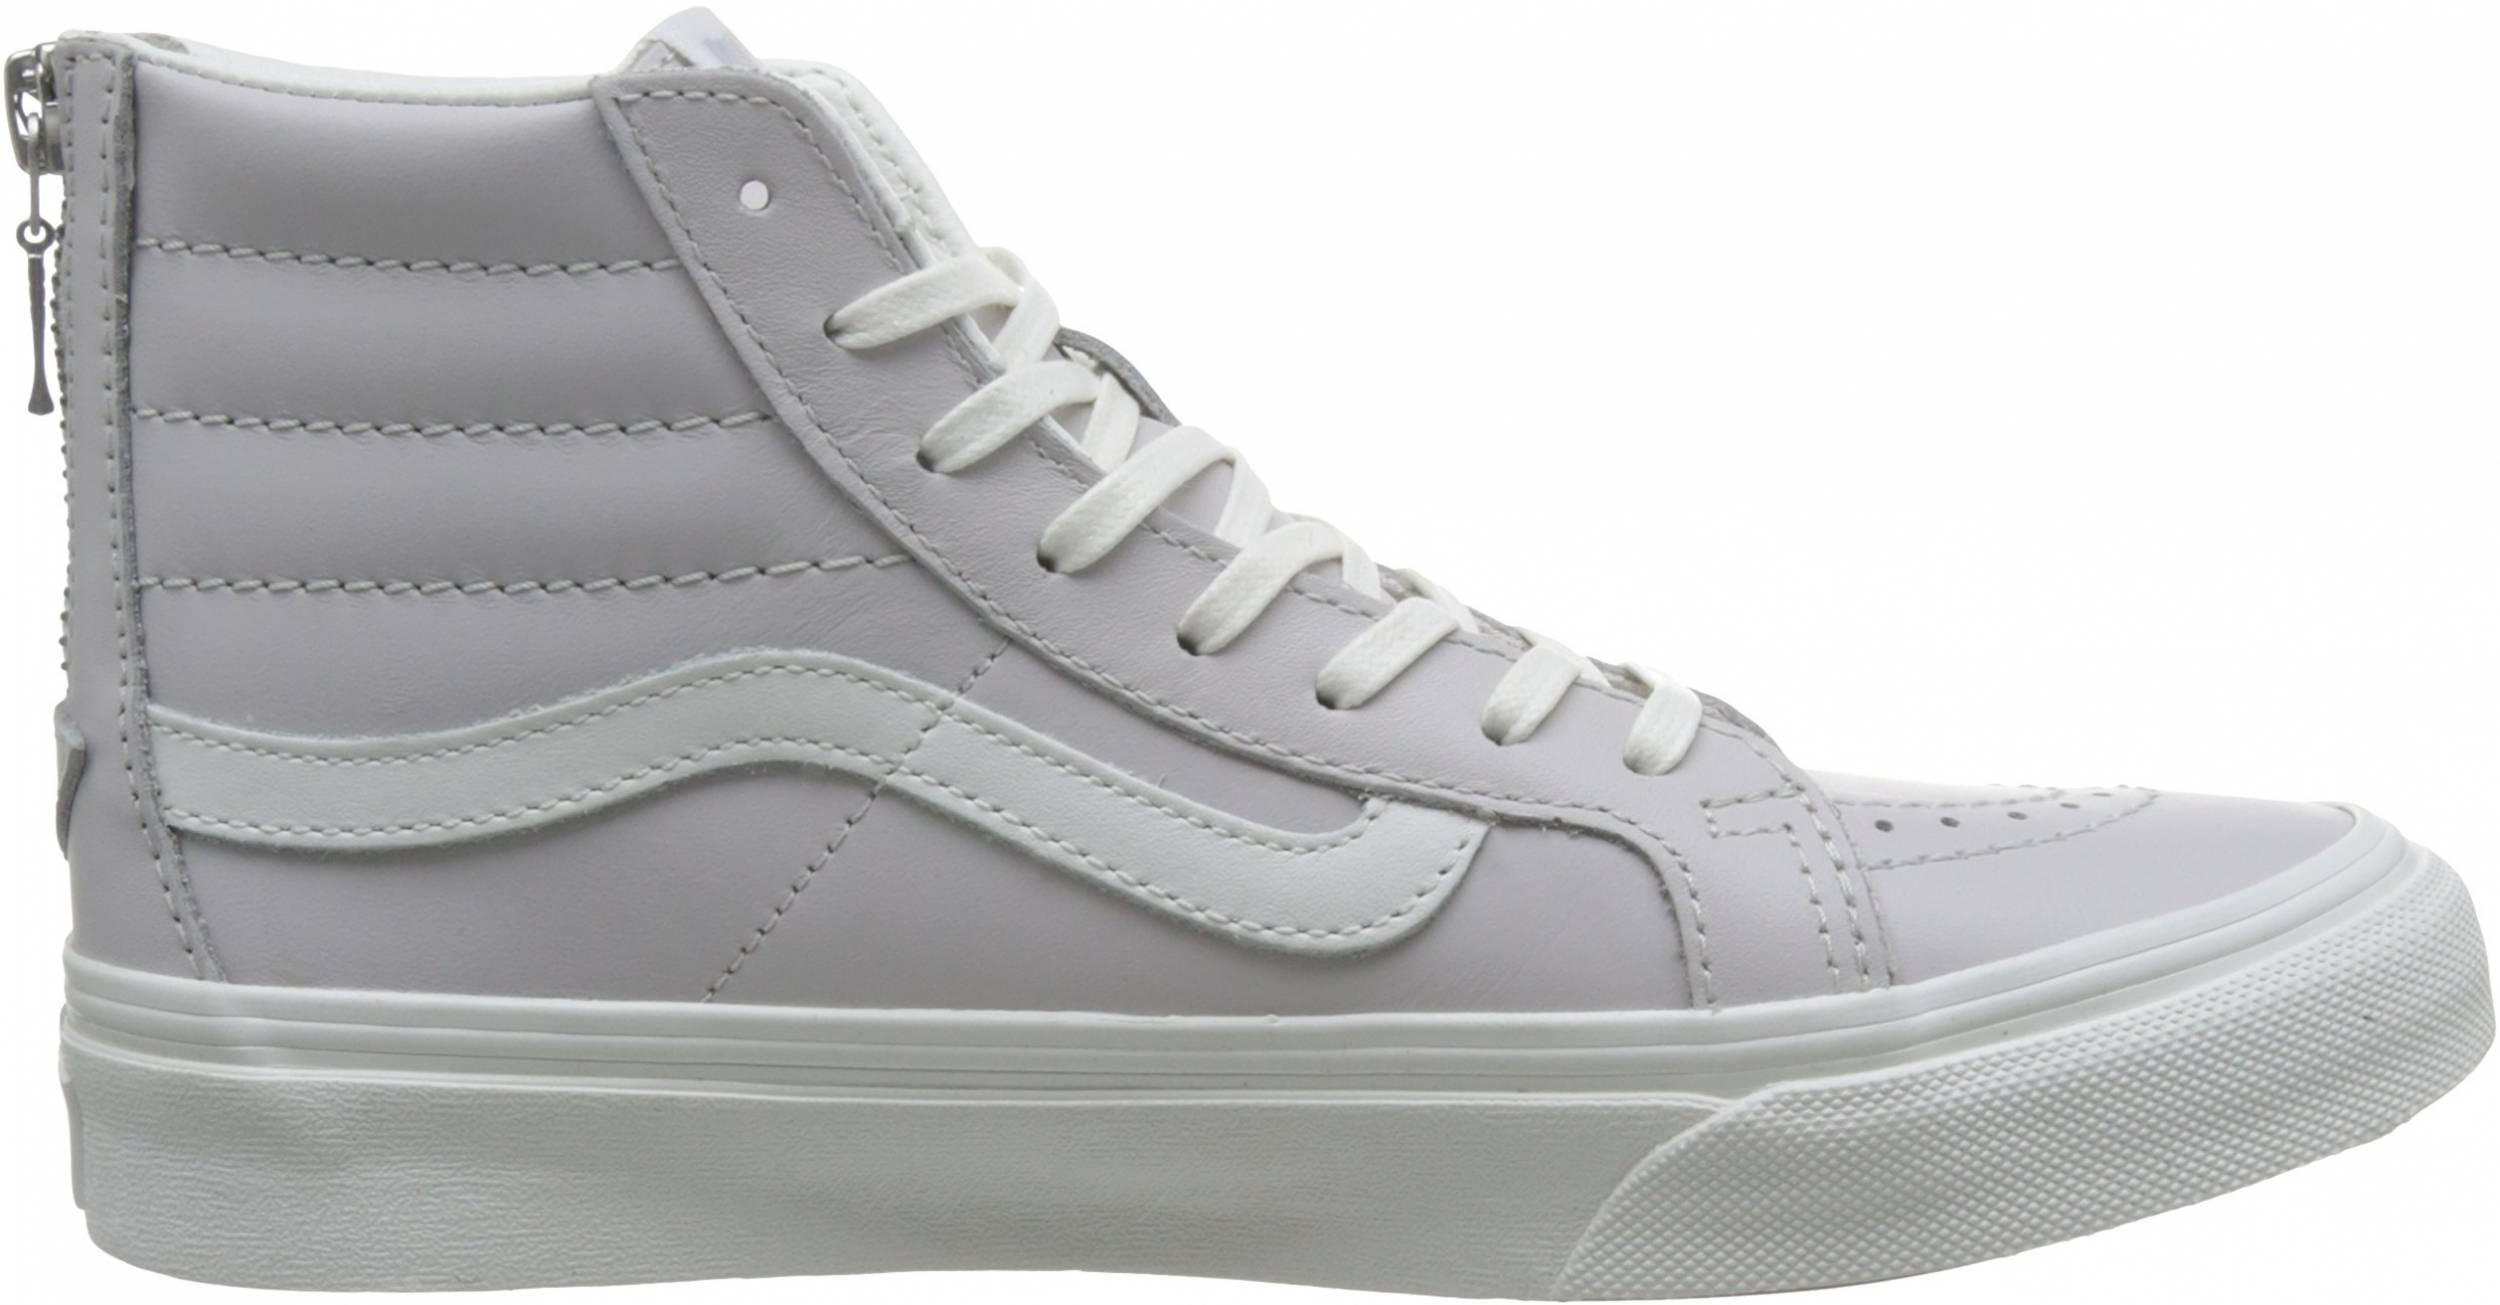 Vans Leather SK8-Hi Slim Zip